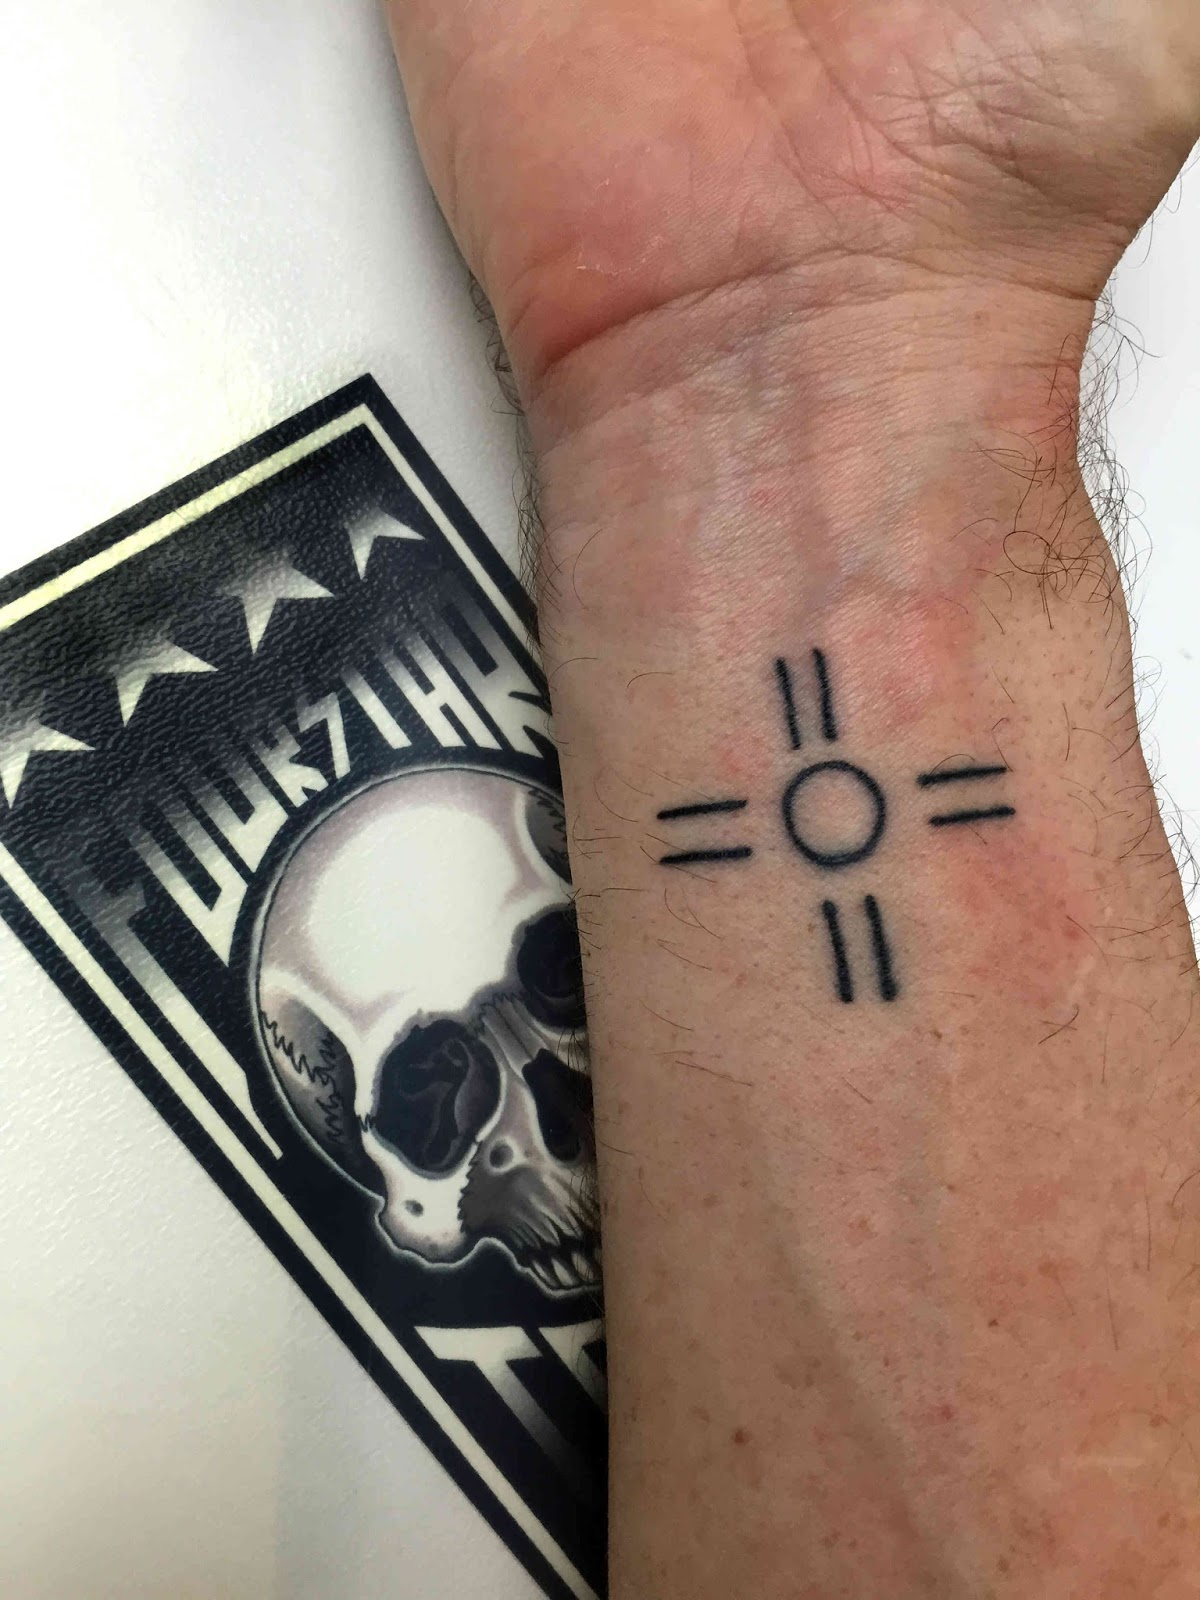 Randome Specifics A Family Tattoo Saga